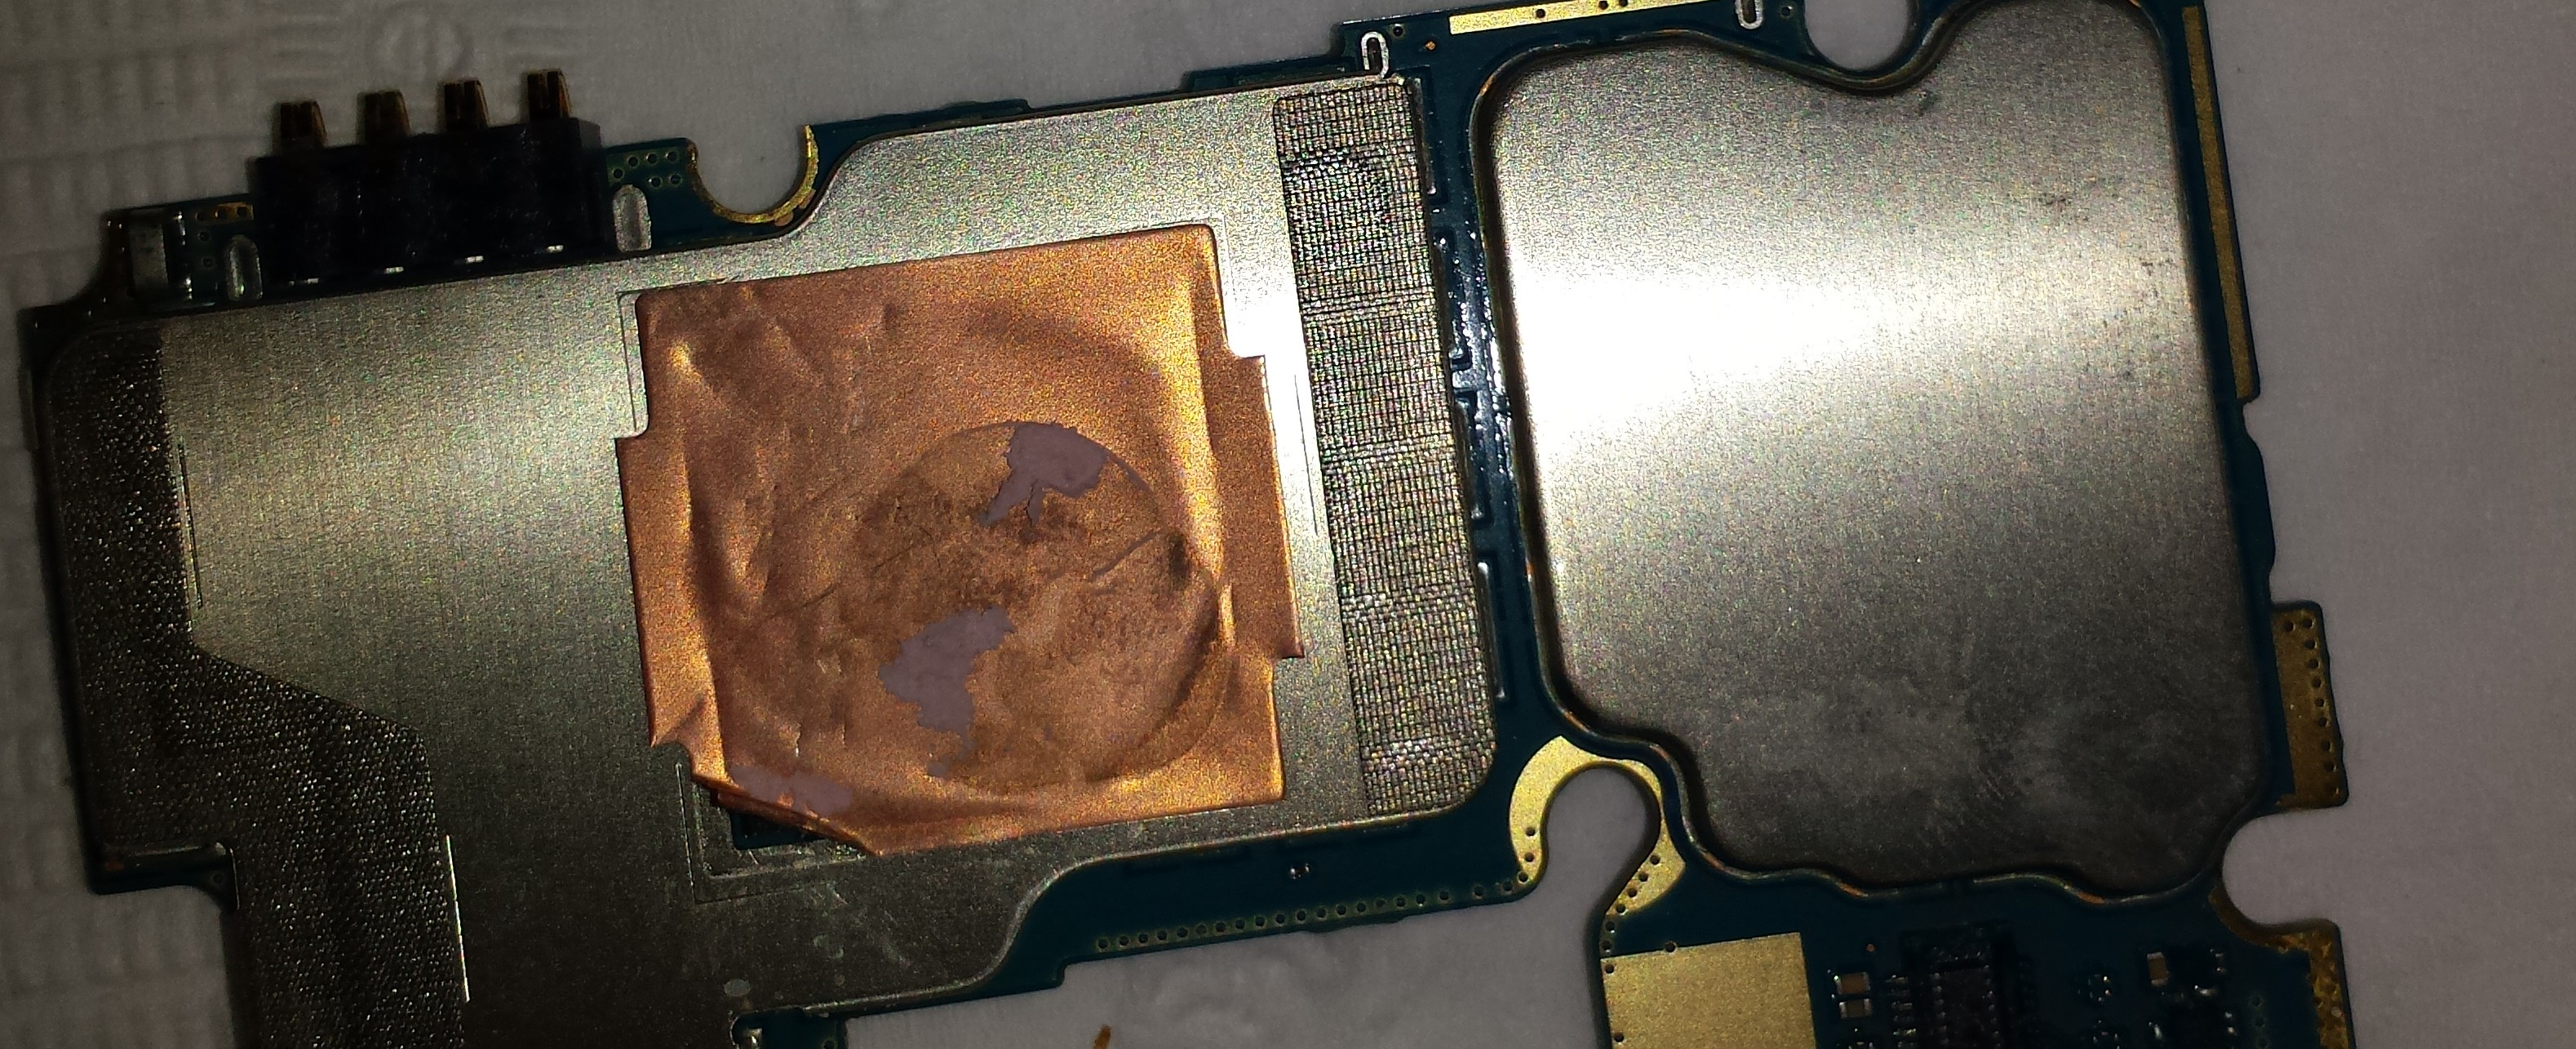 Peeling Off the Copper Foil.jpg